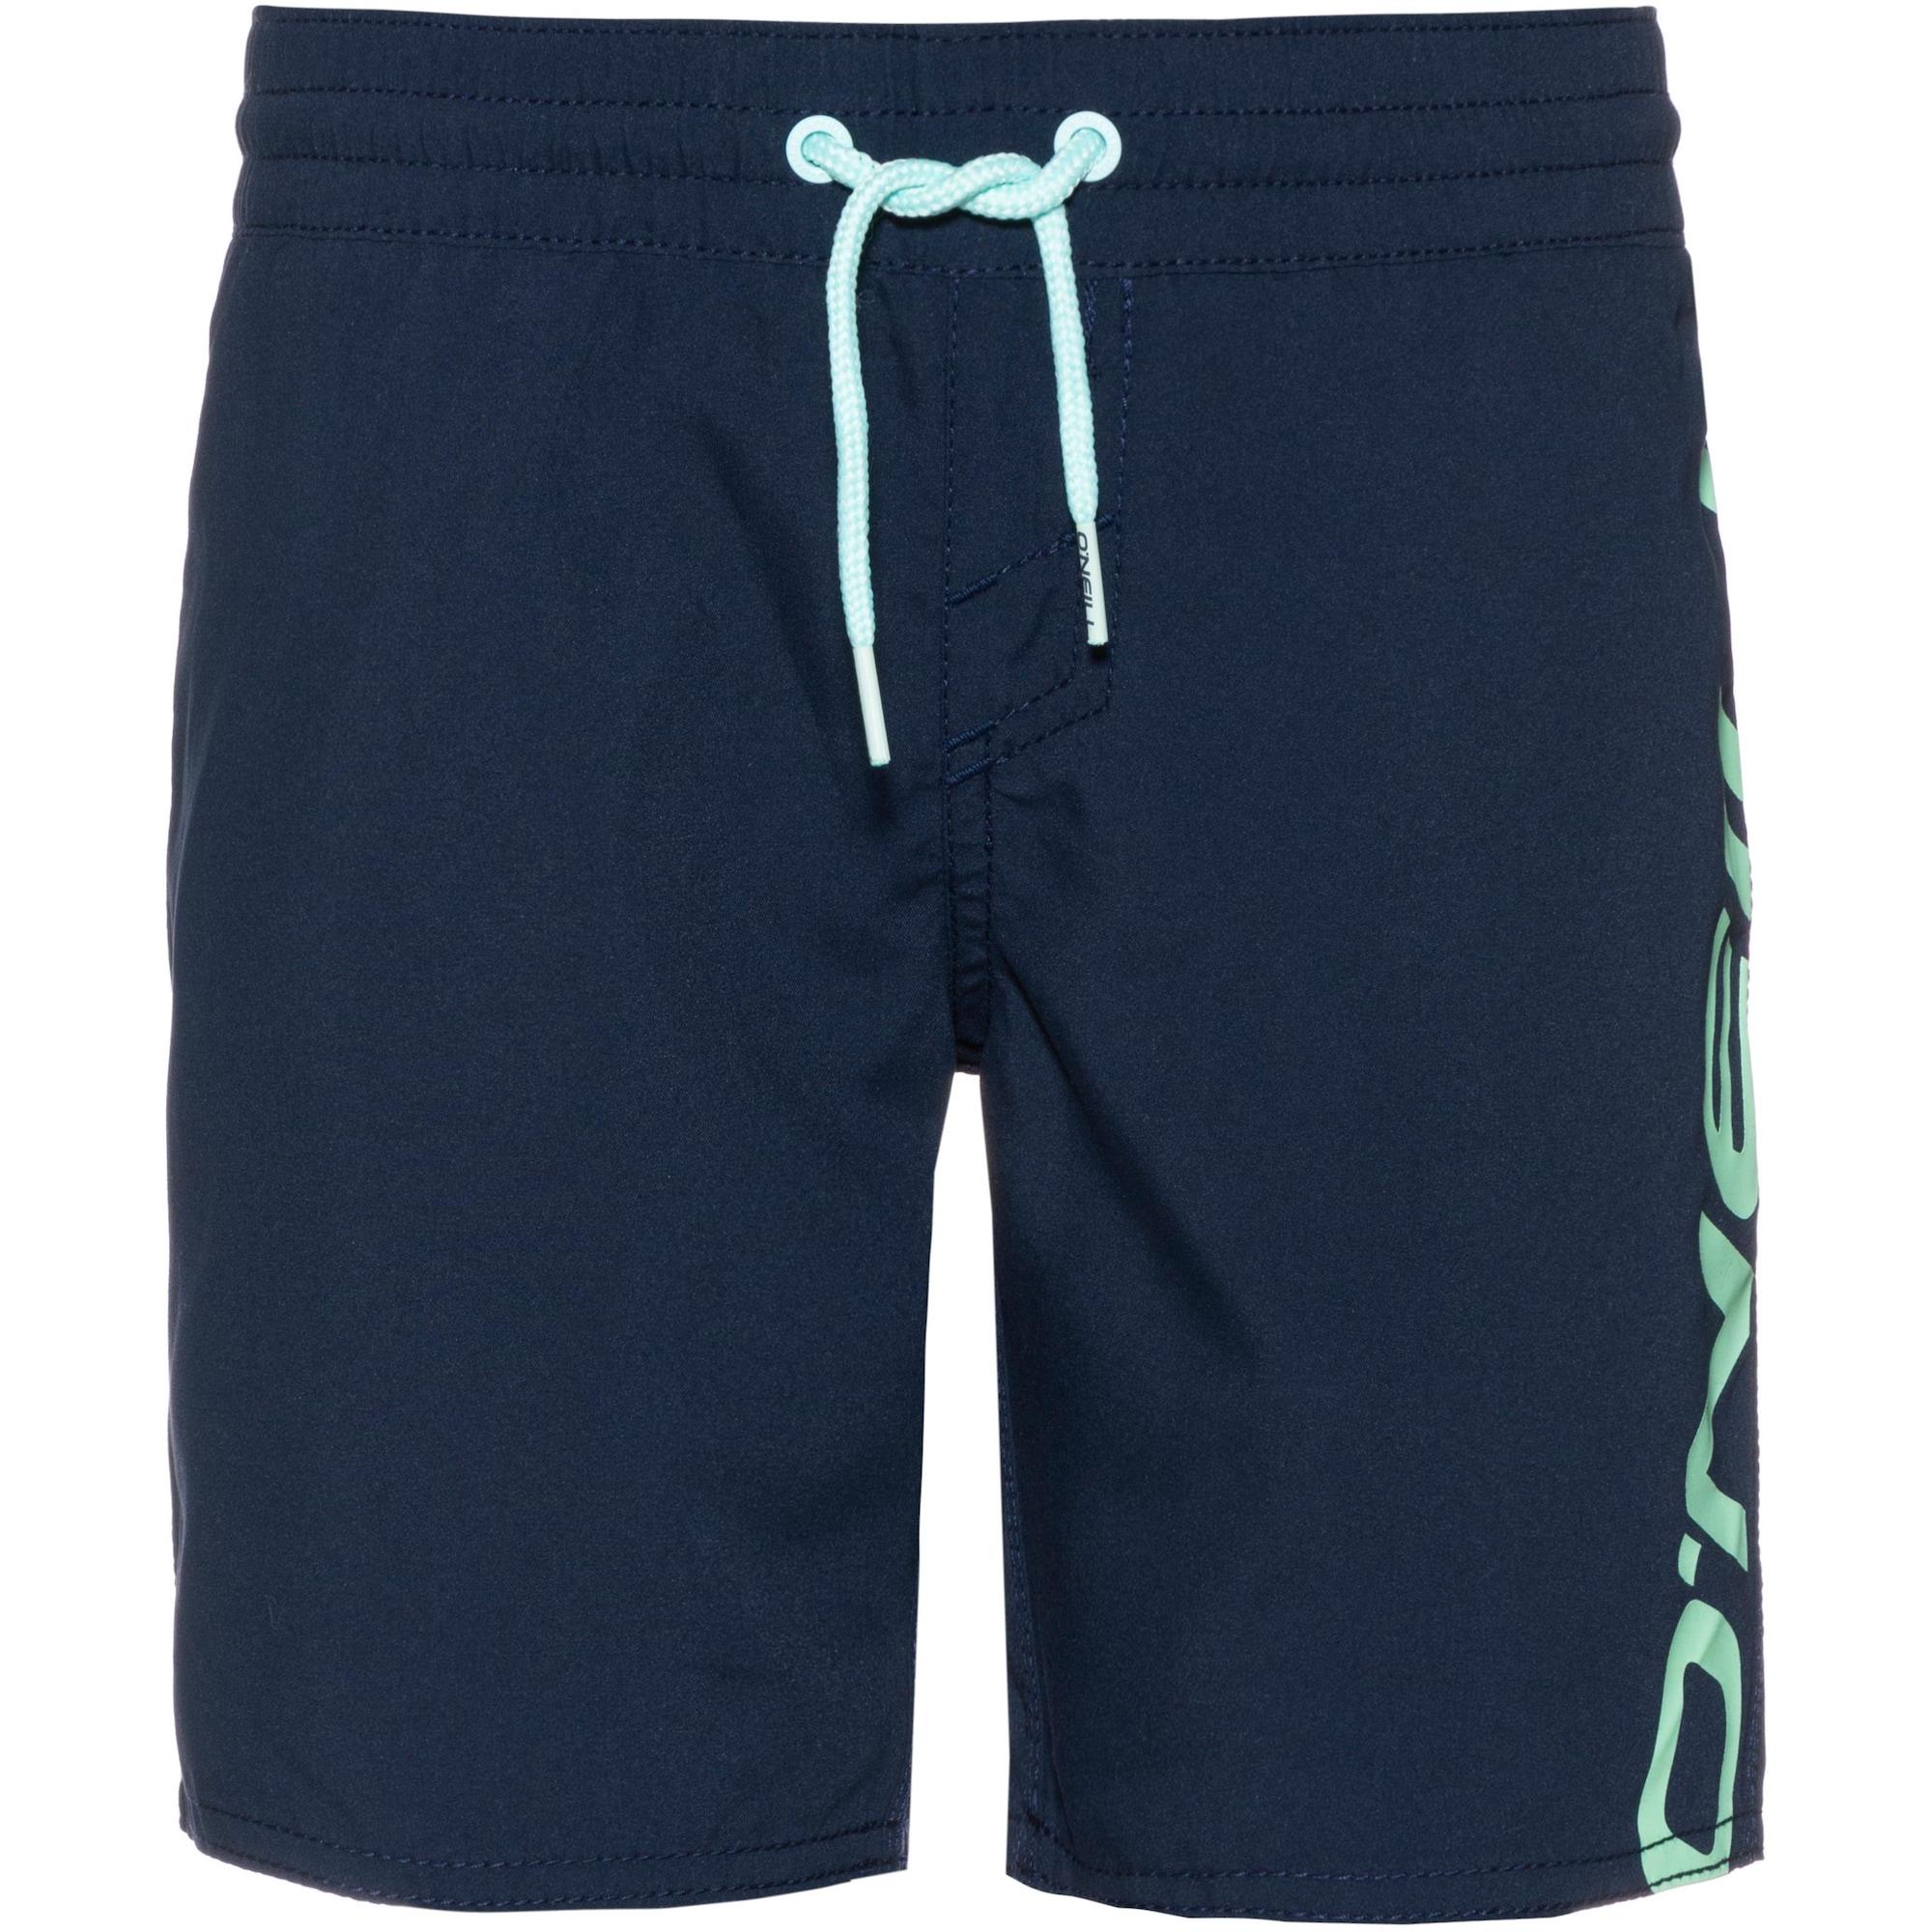 ONEILL Sportovní plavky PB Cali tmavě modrá O'NEILL